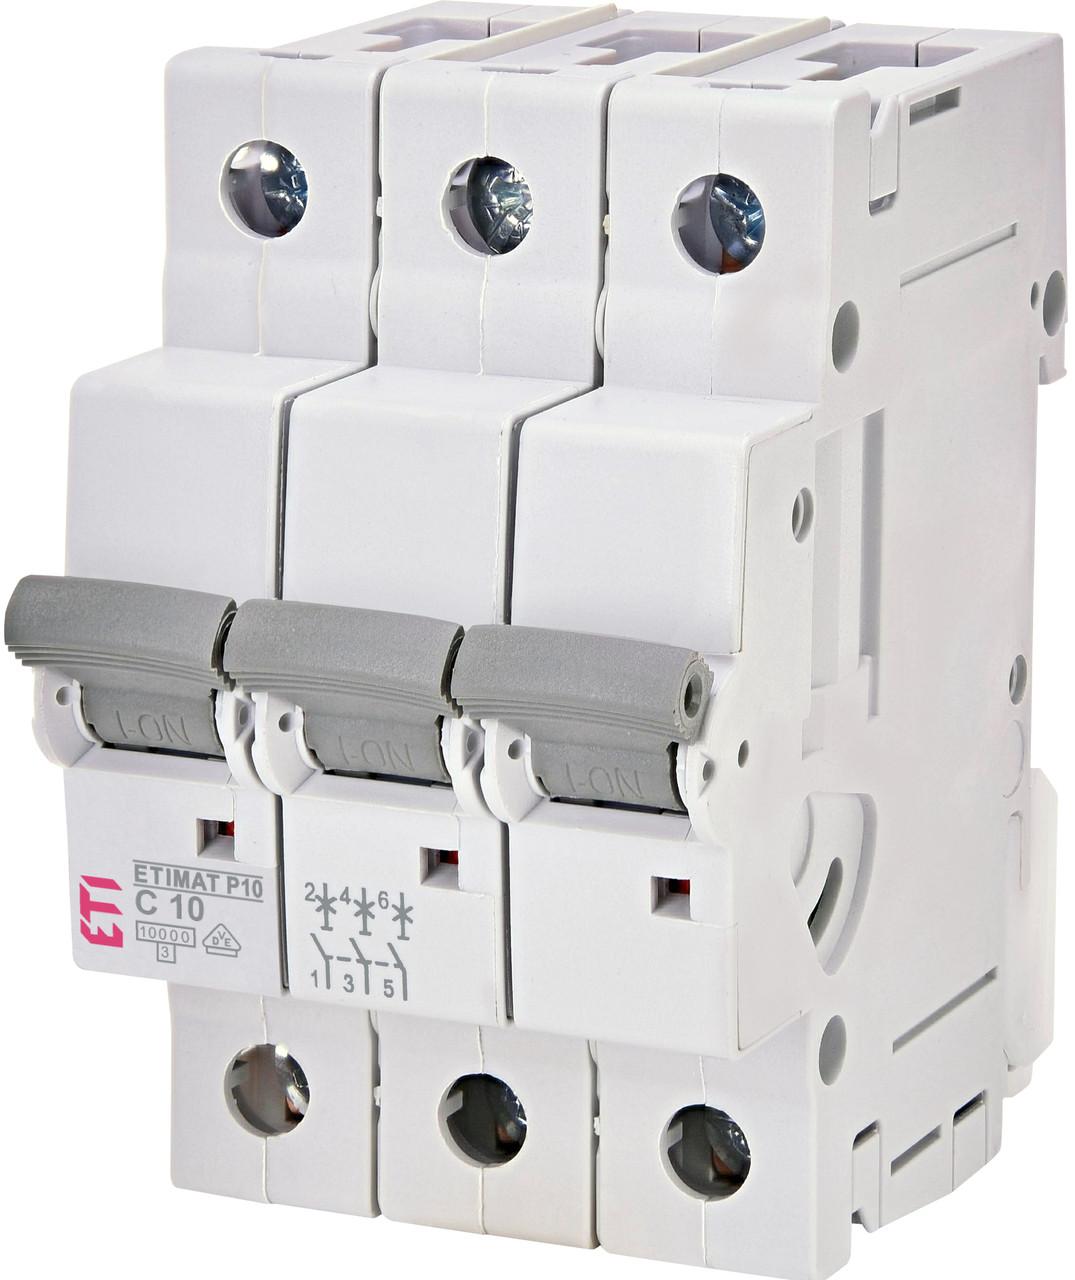 Авт. вимикач ETI ETIMAT P10 3p 10A 10kA 271031101